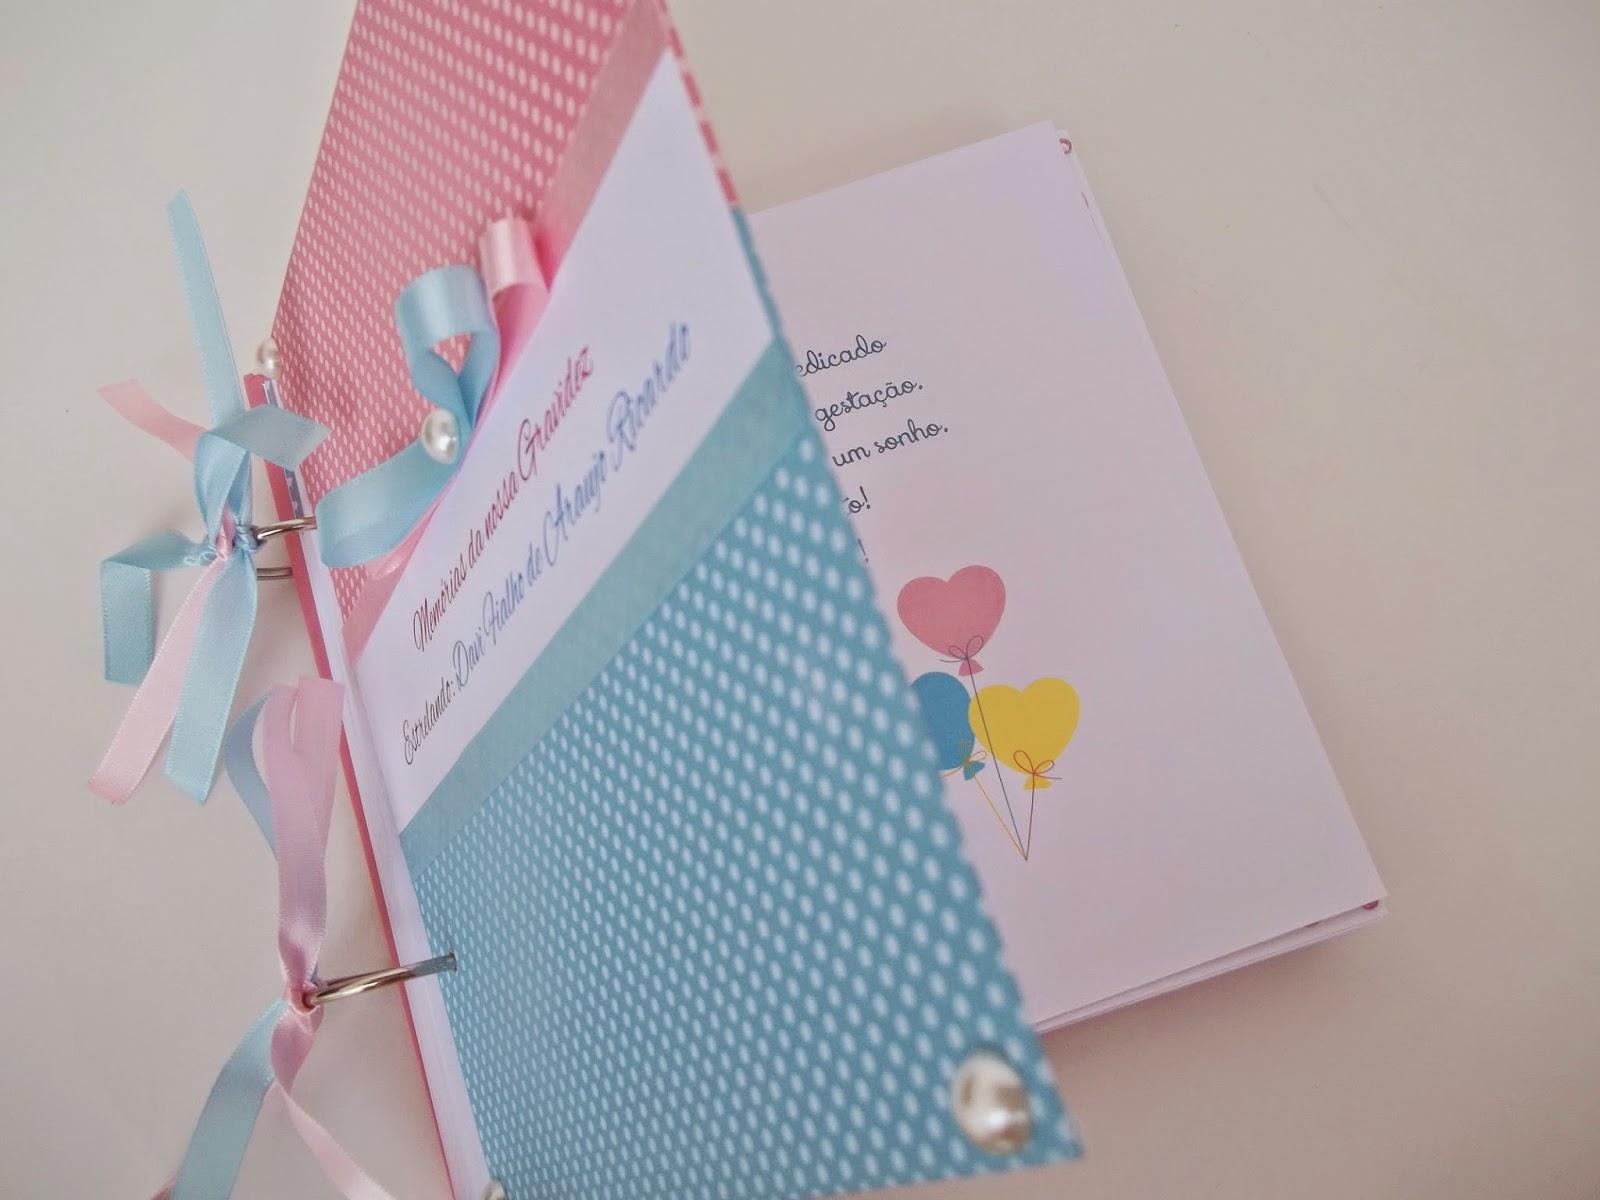 álbum scrapbook gravidez,  recordações, presente para grávida, diário gravidez, unissex, menino